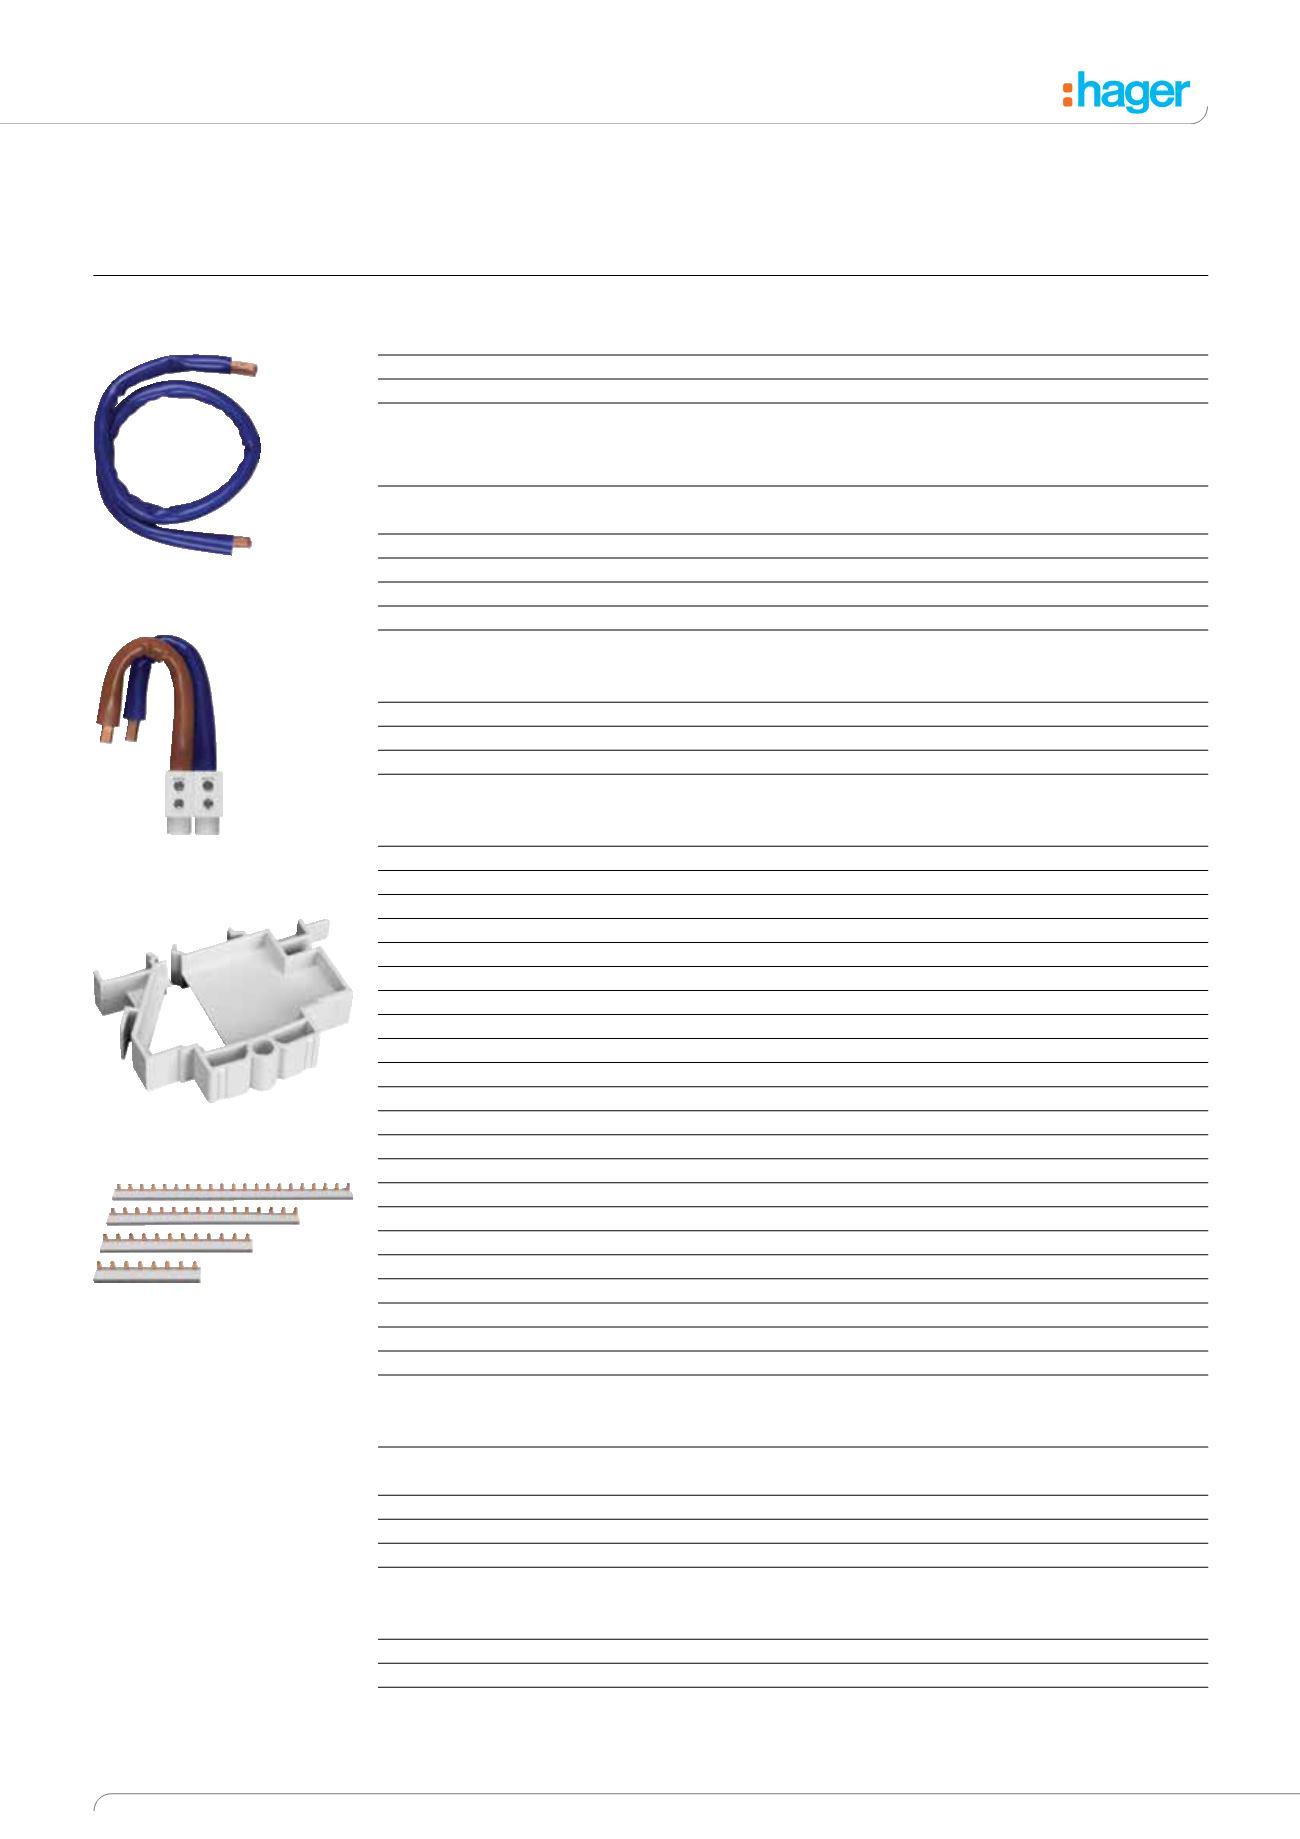 hager consumer unit catalogue 2013. Black Bedroom Furniture Sets. Home Design Ideas